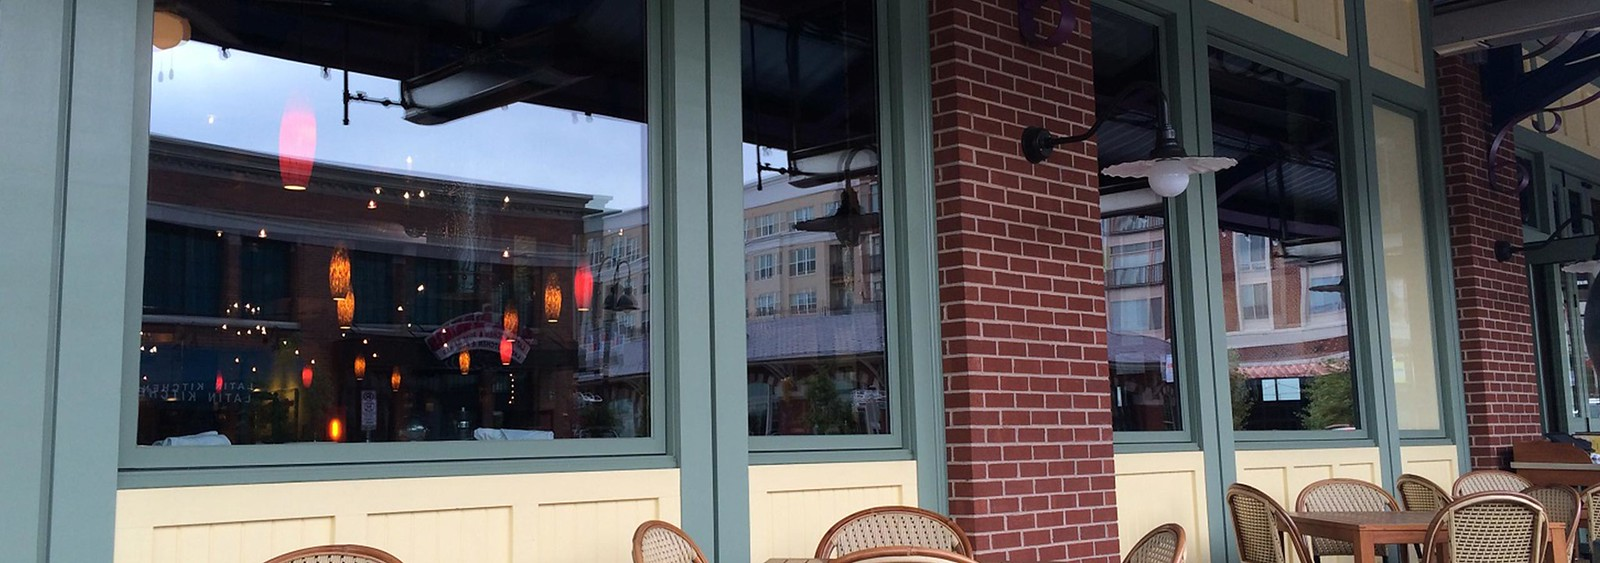 Boral TruExterior Trim on restaurant storefront